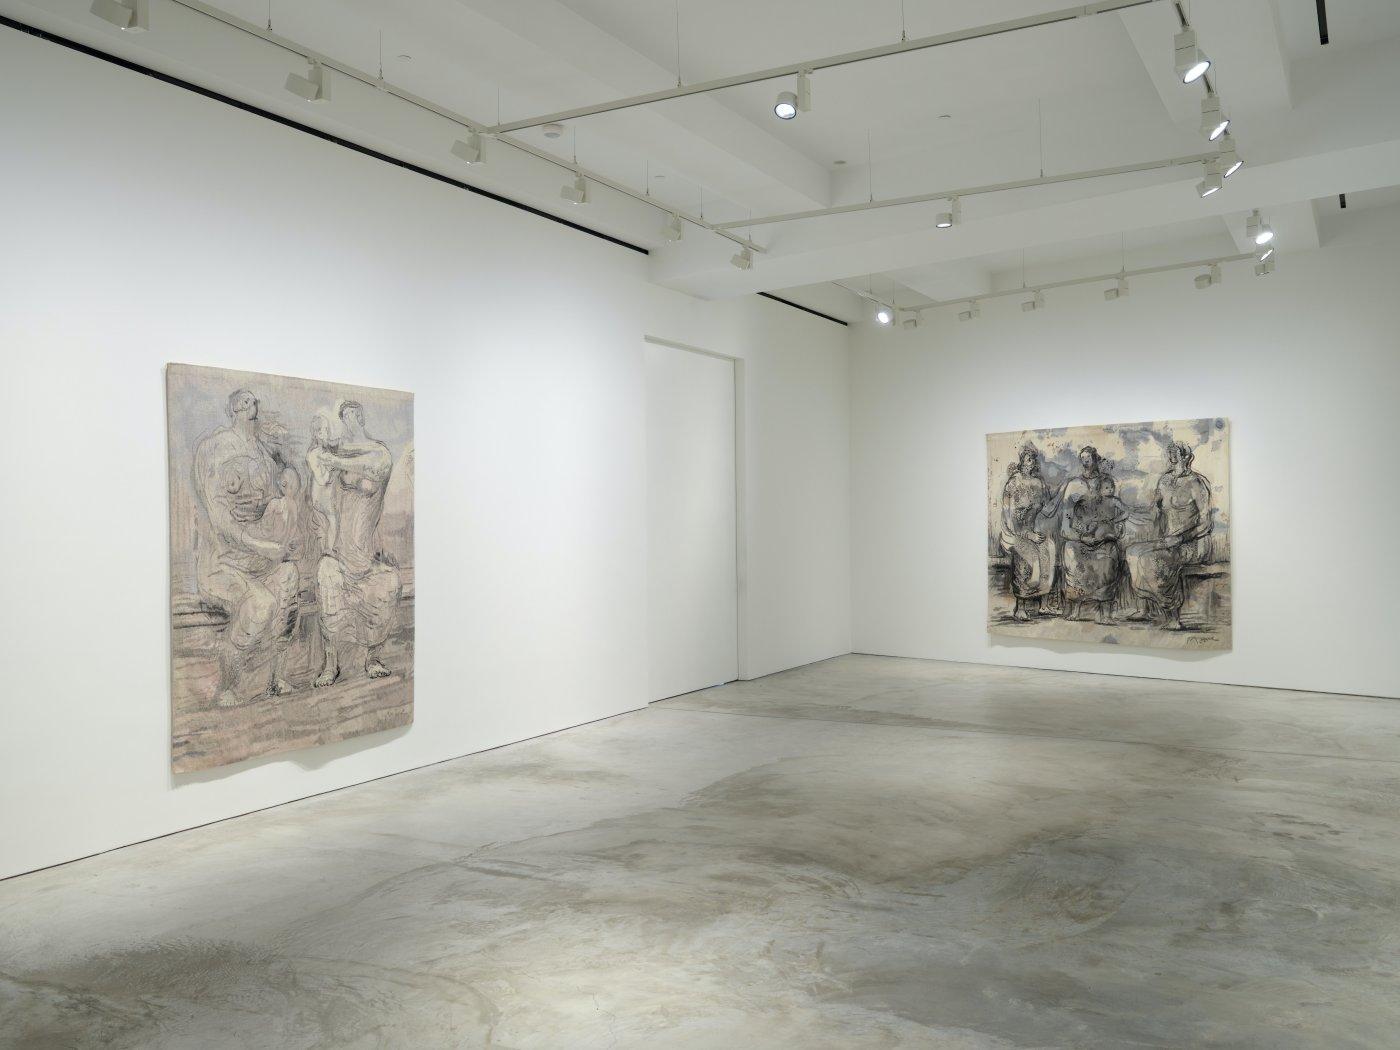 Hauser Wirth Hong Kong Henry Moore 3